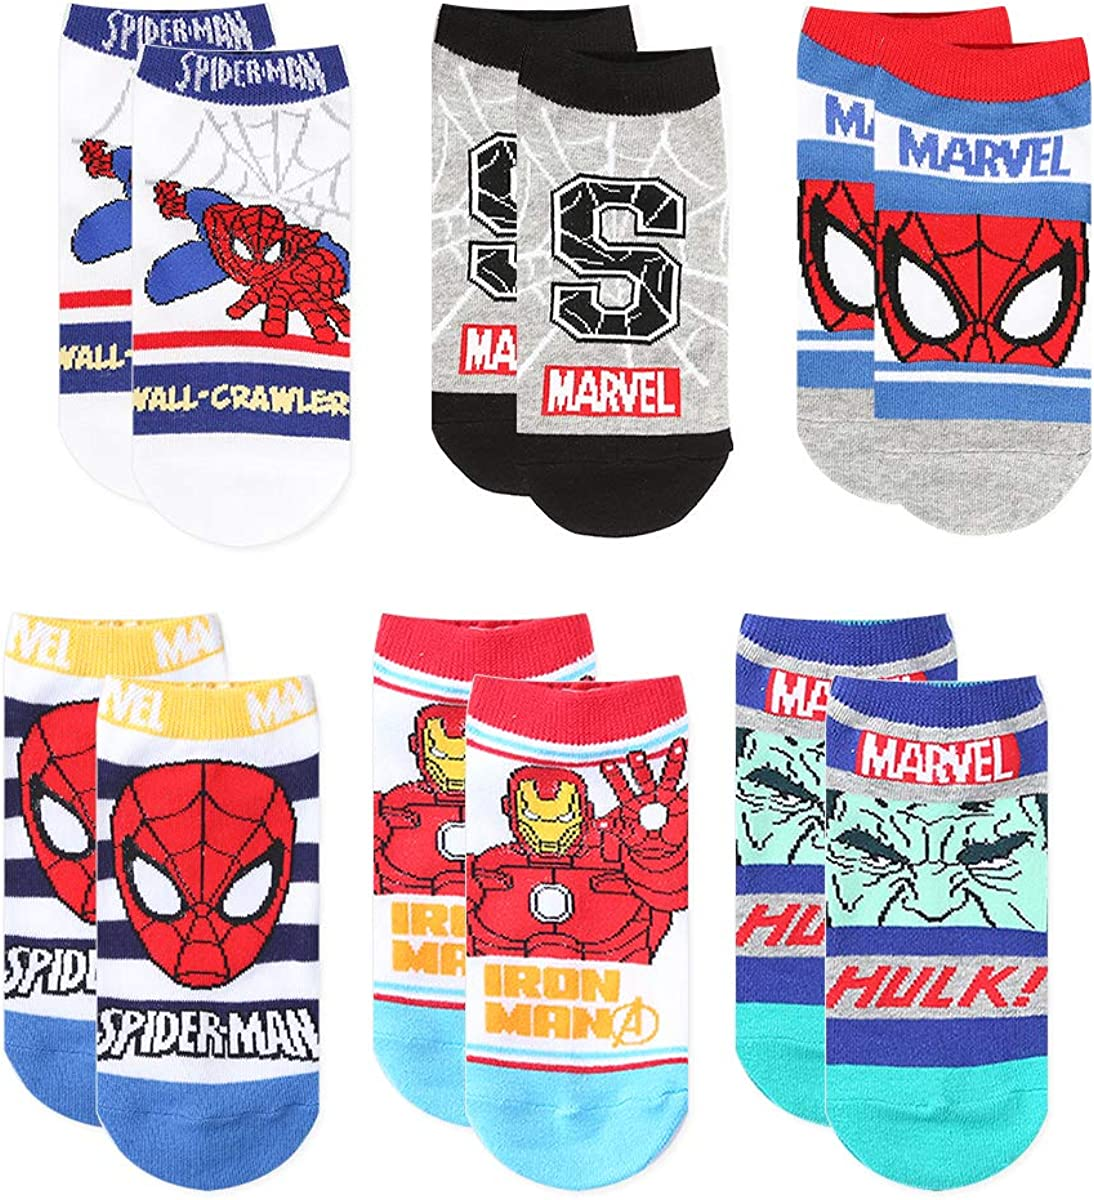 6 Pairs Premium No Show Socks for Boys